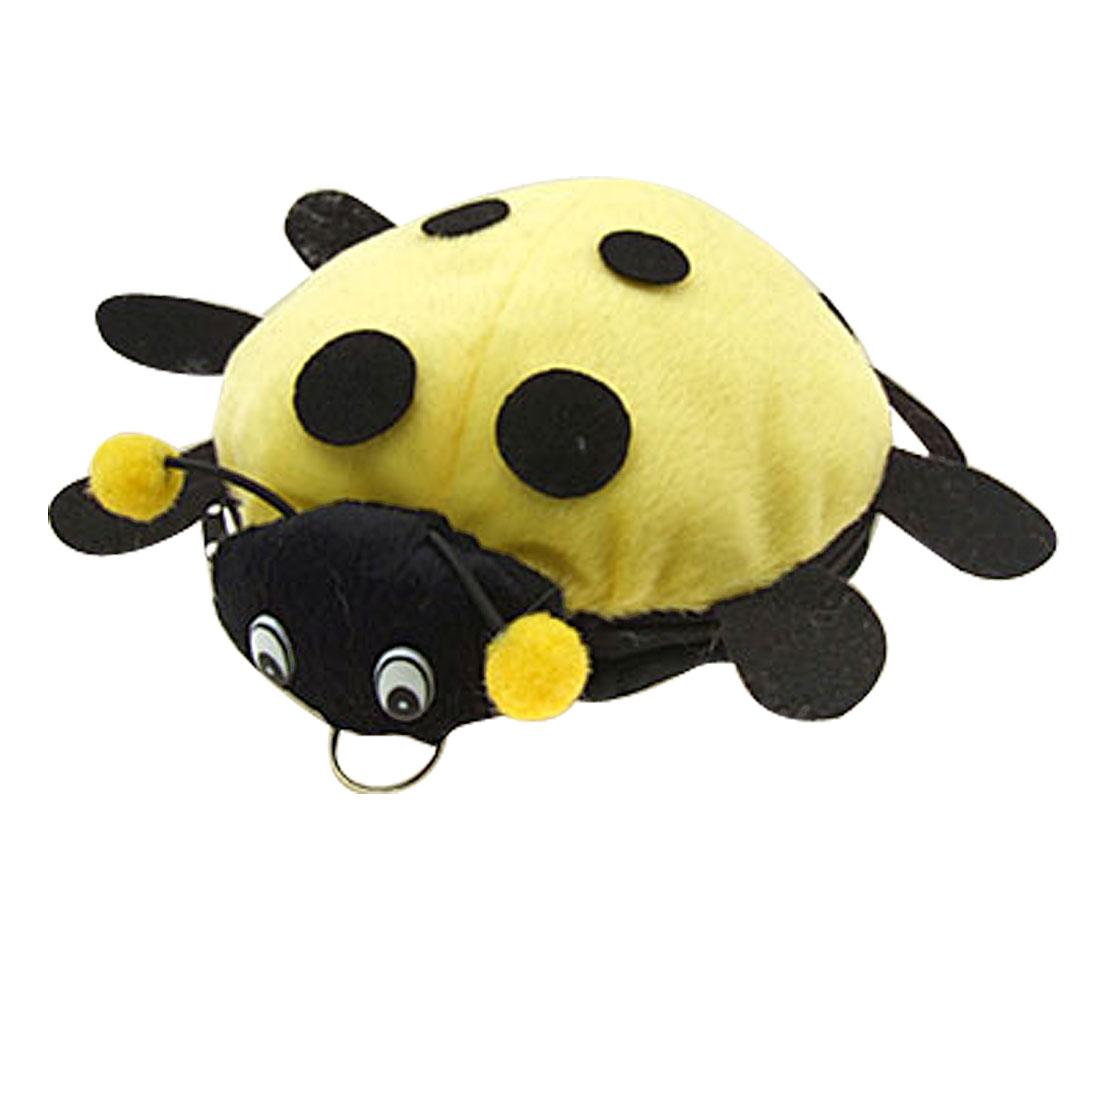 Ladybug Portable CD DVD Carrying Case Holds 12 Disks